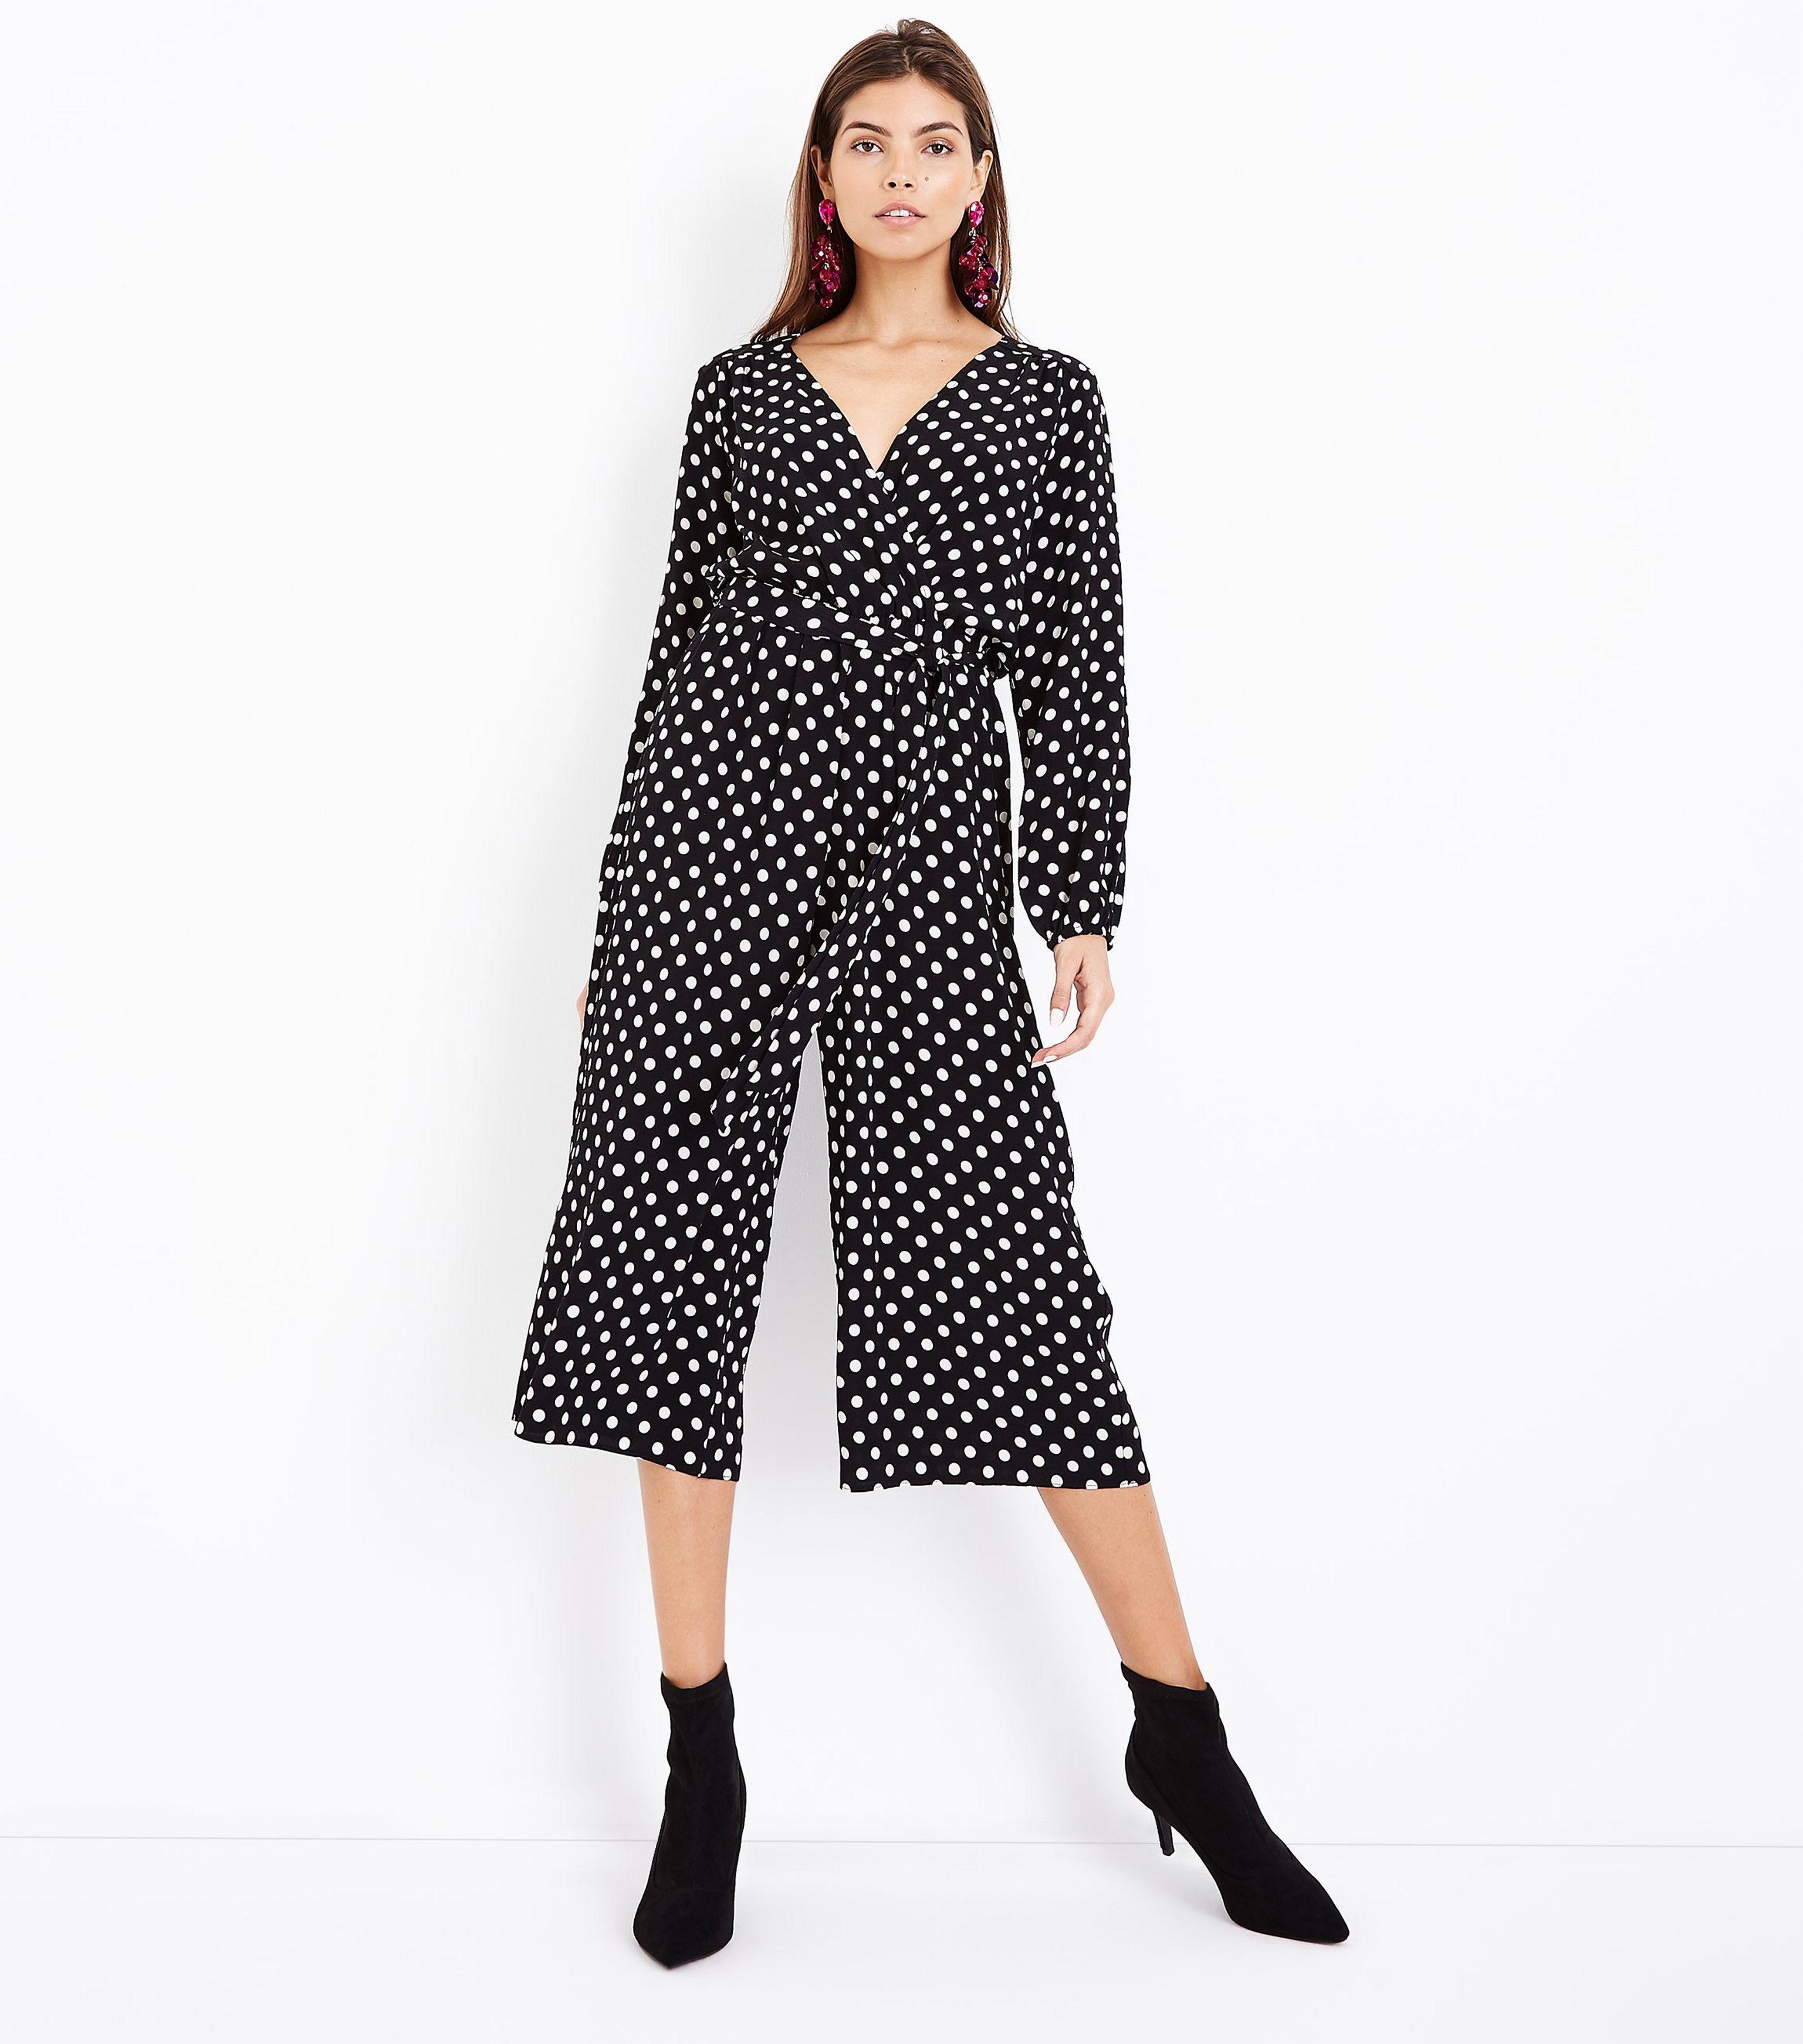 68f136cb206 New Look Black Polka Dot Wrap Front Jumpsuit in Black - Lyst